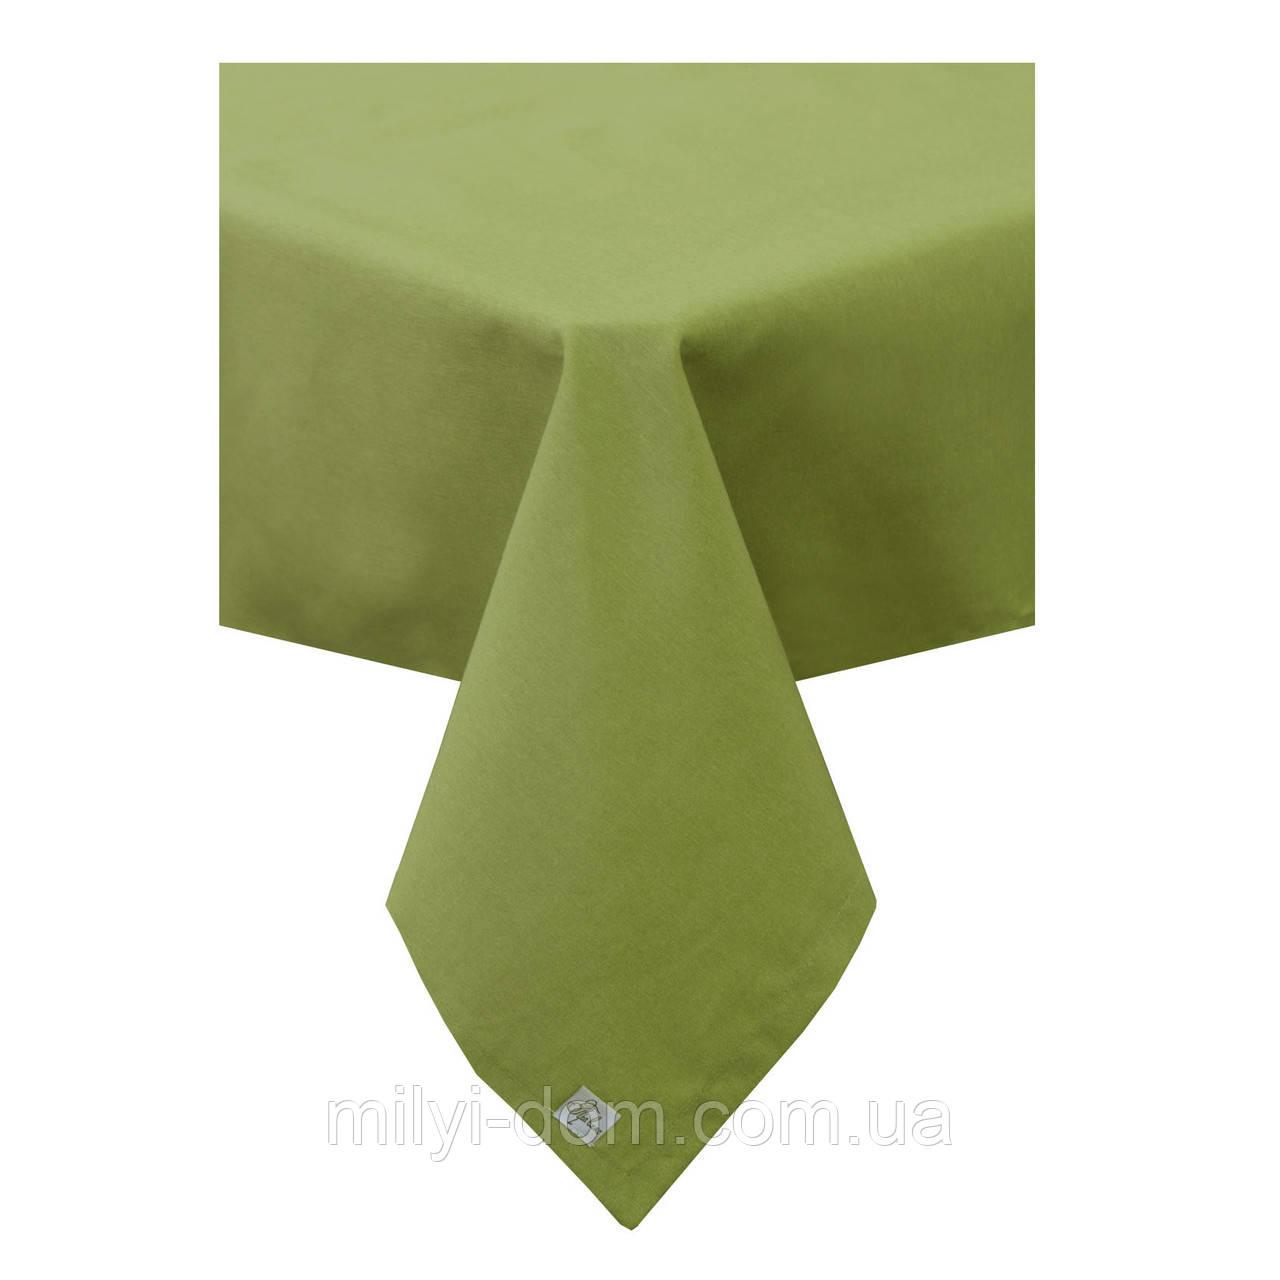 "Скатерть ""Зелень"", 60% хлопок, 132х220 см"